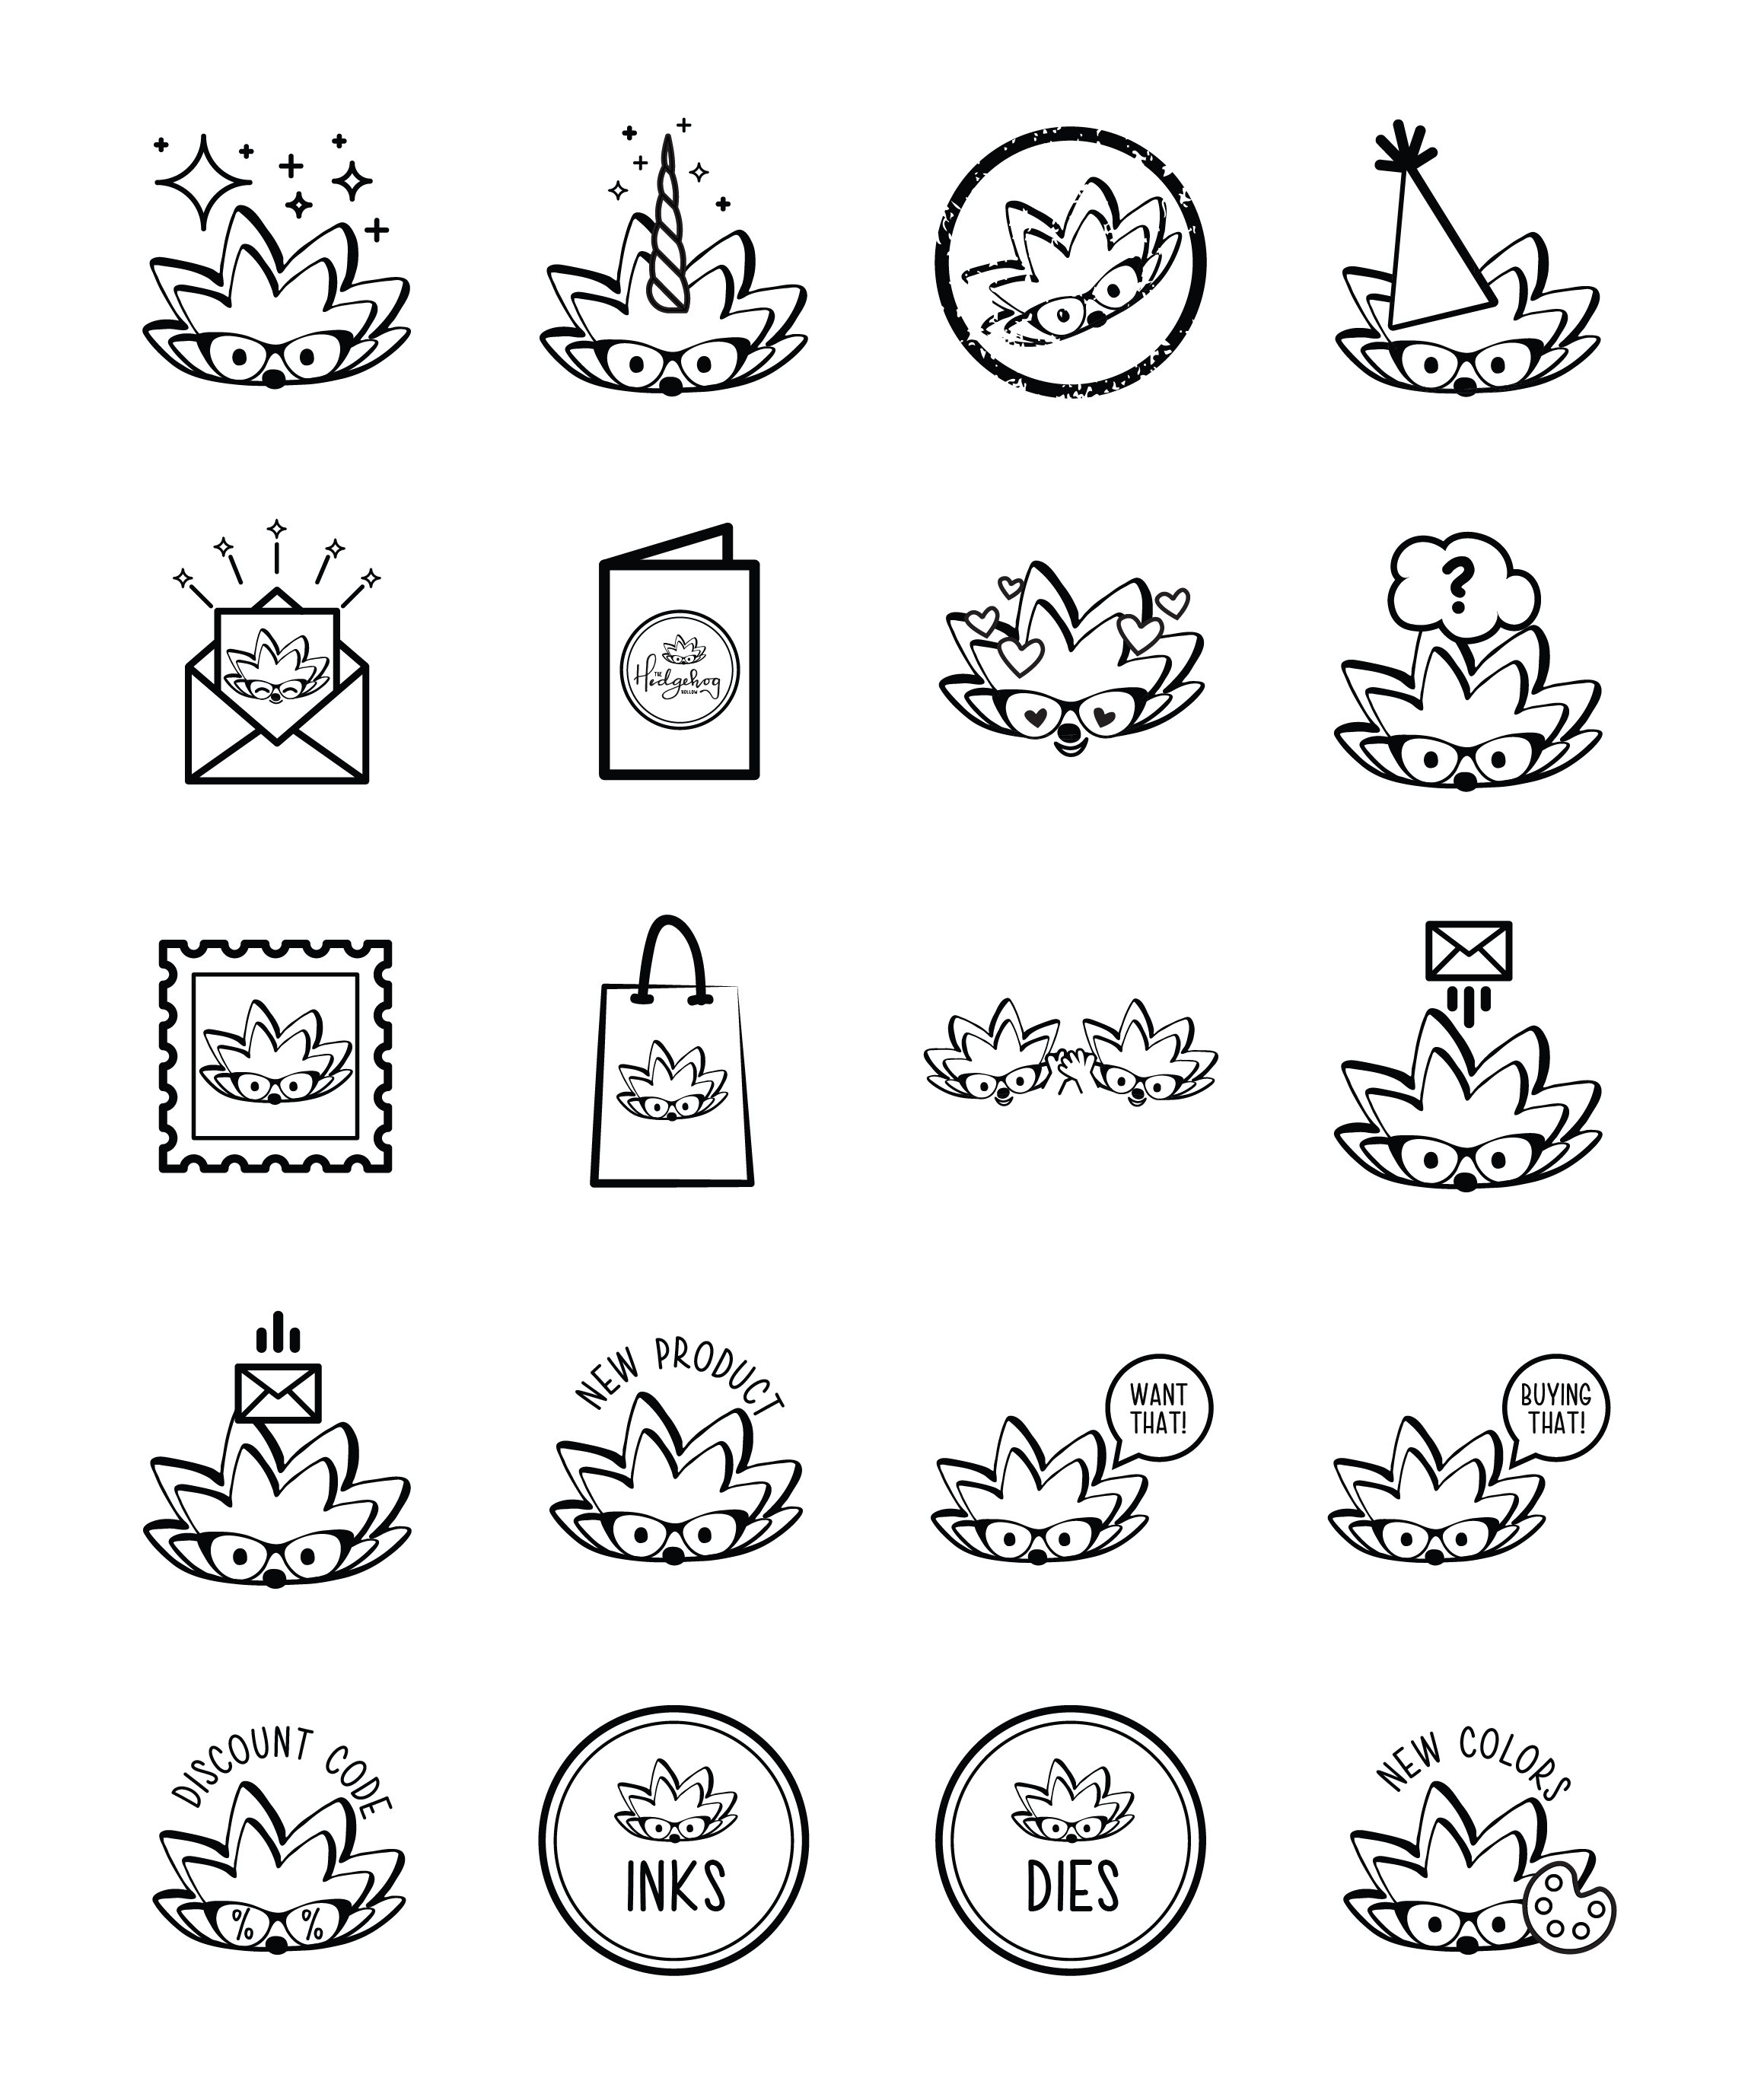 HH 20 emojis - v1-01.jpg